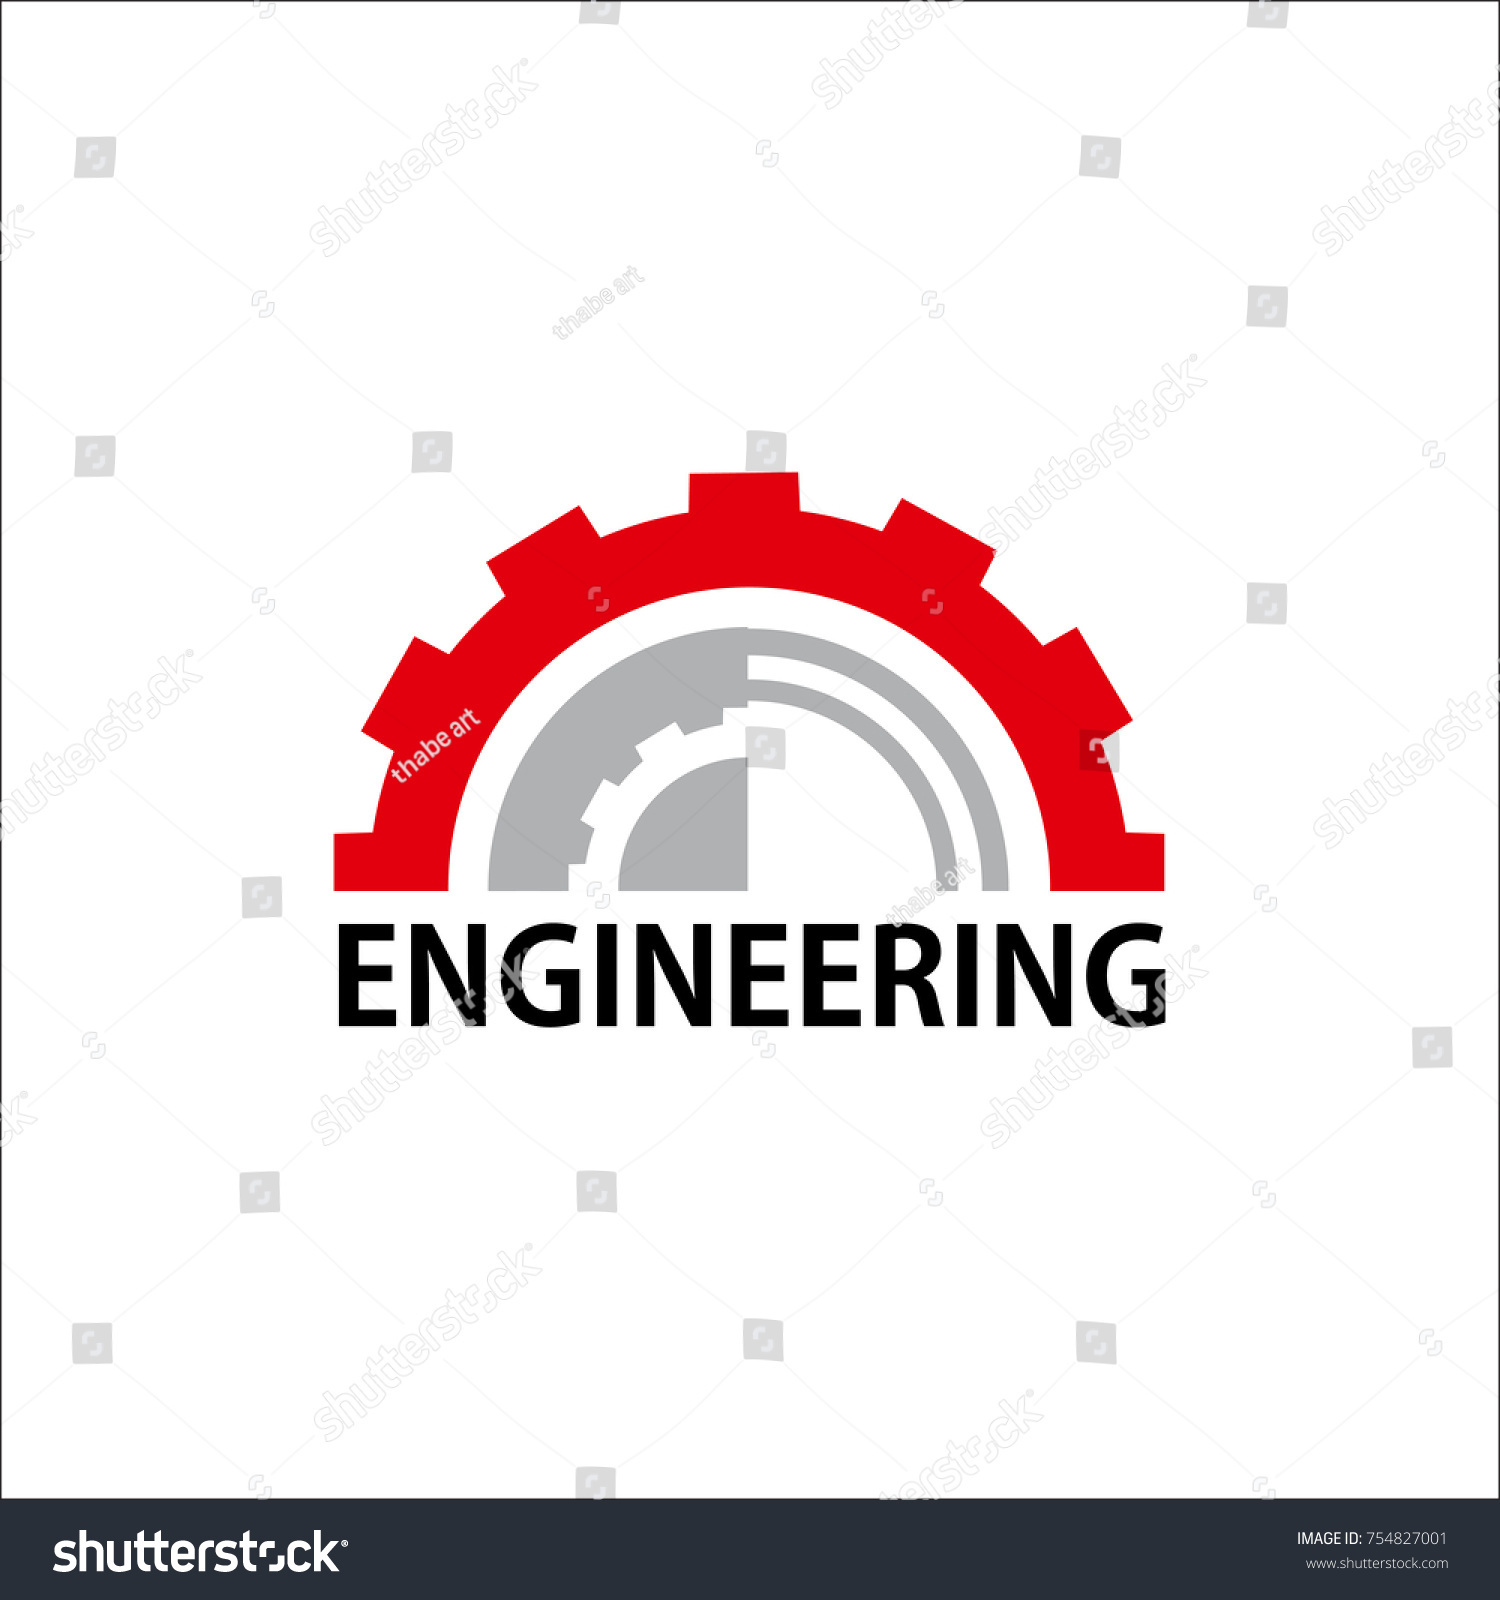 Engineering Logo Vector Design Template Stock Vector (Royalty Free ...